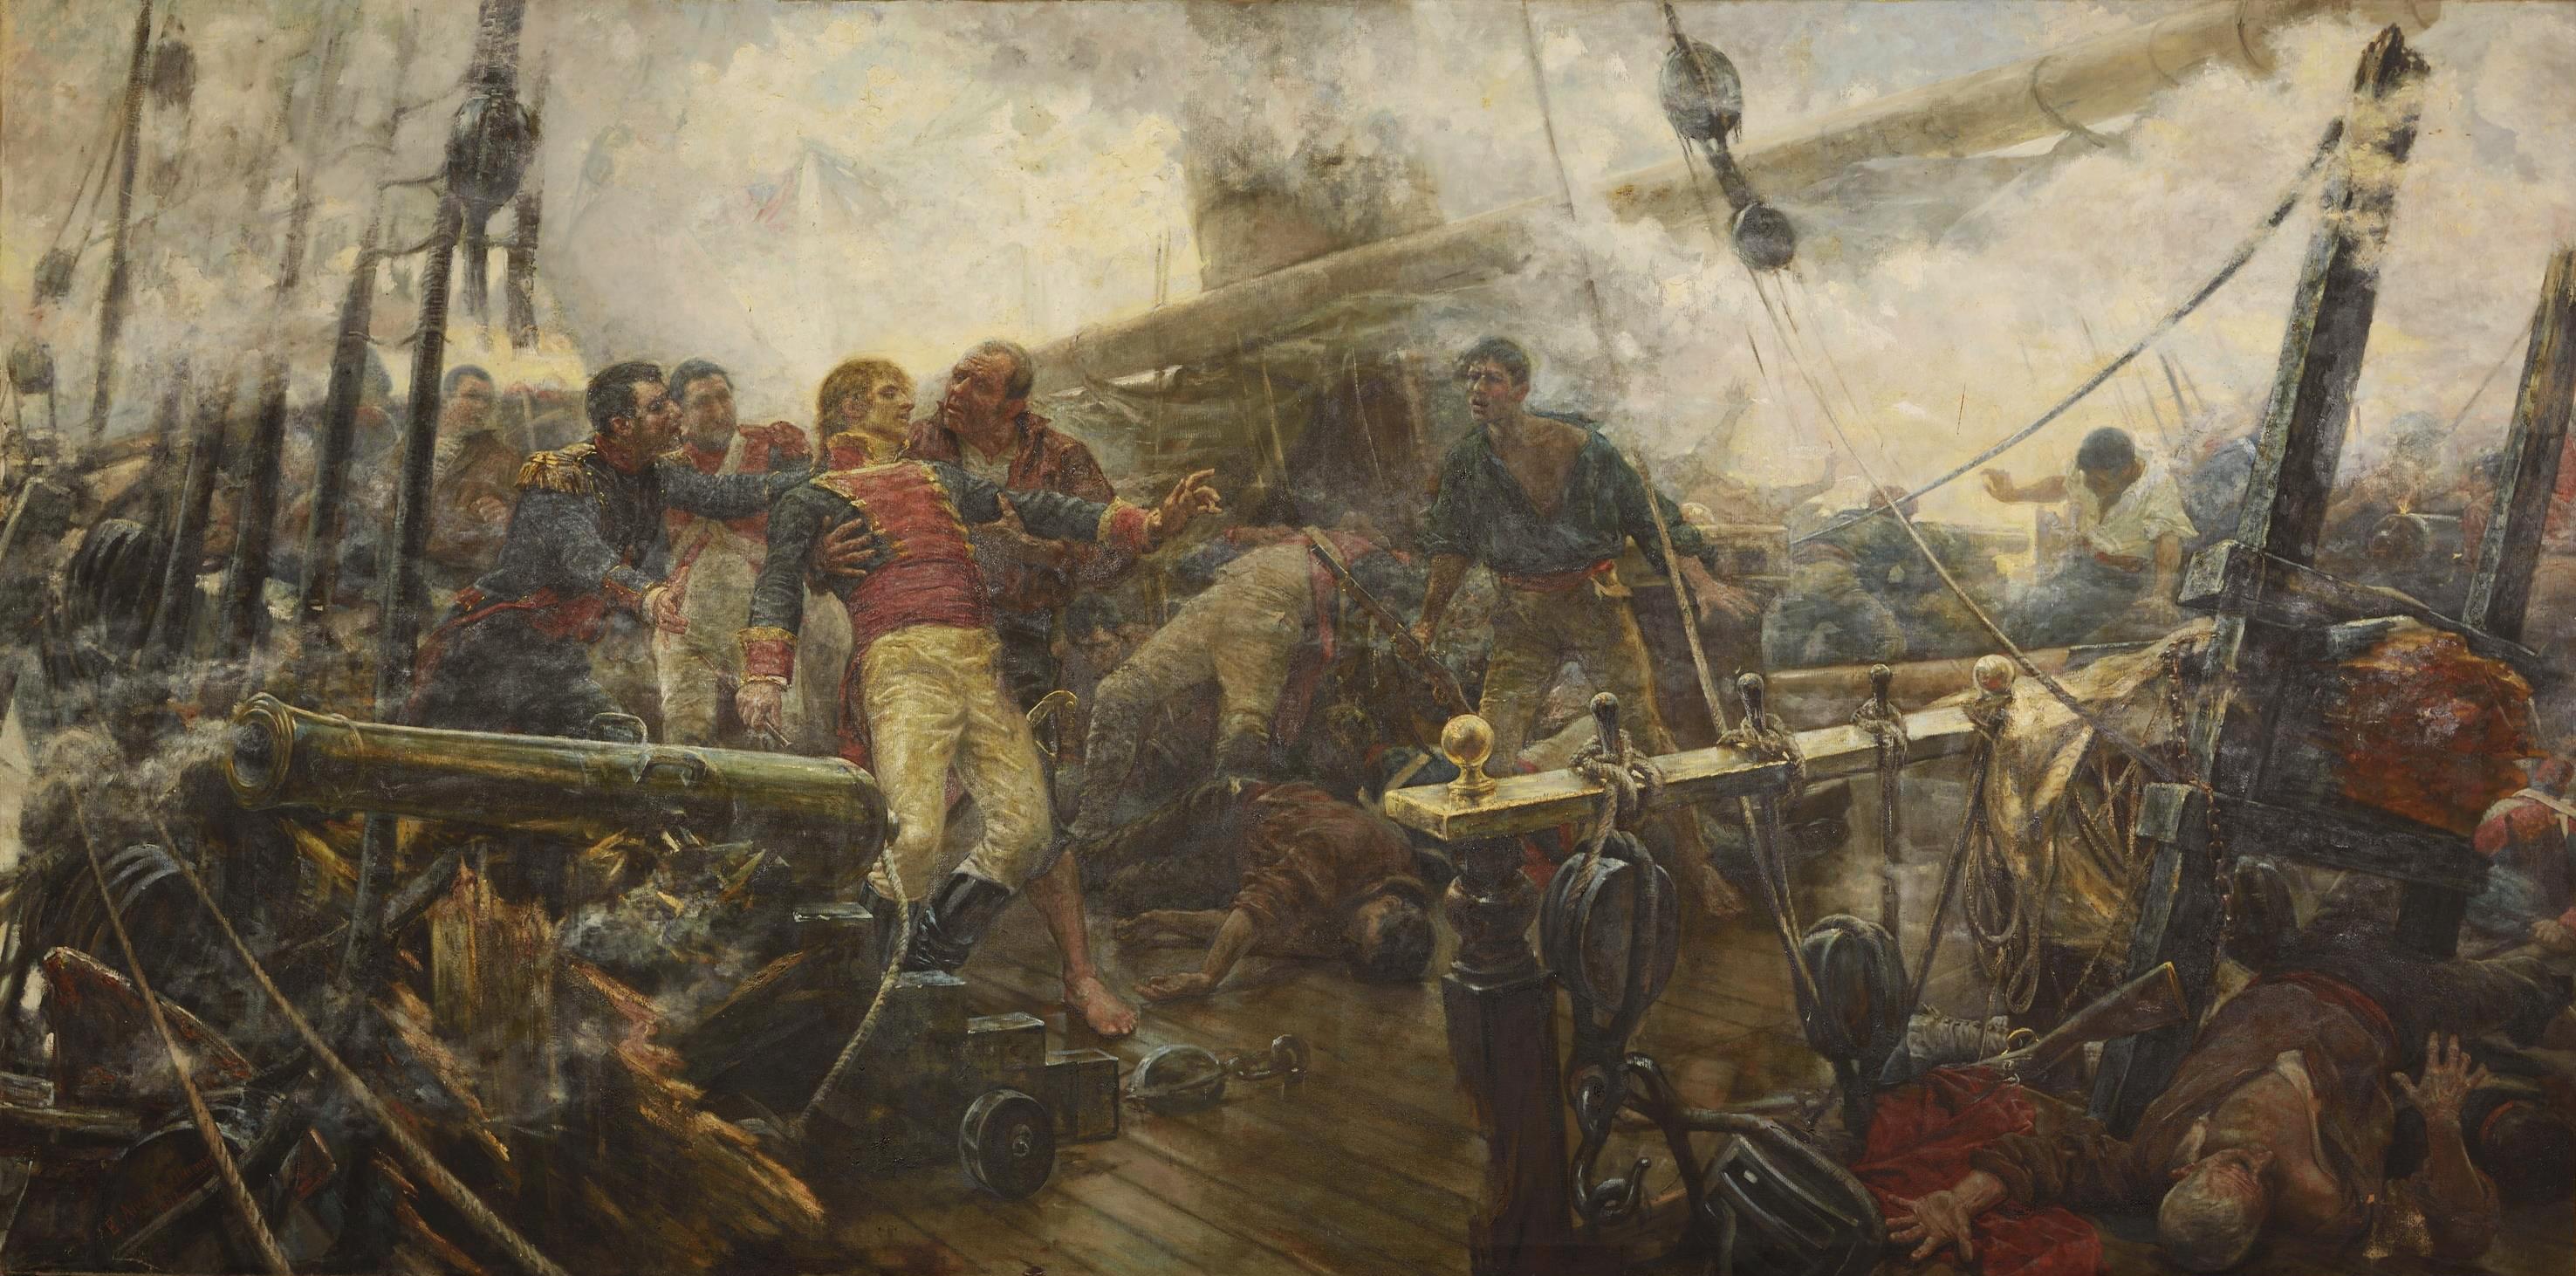 Churruca's Death, oil on canvas about the Battle of Trafalgar by Eugenio lvarez Dumont, Prado Museum